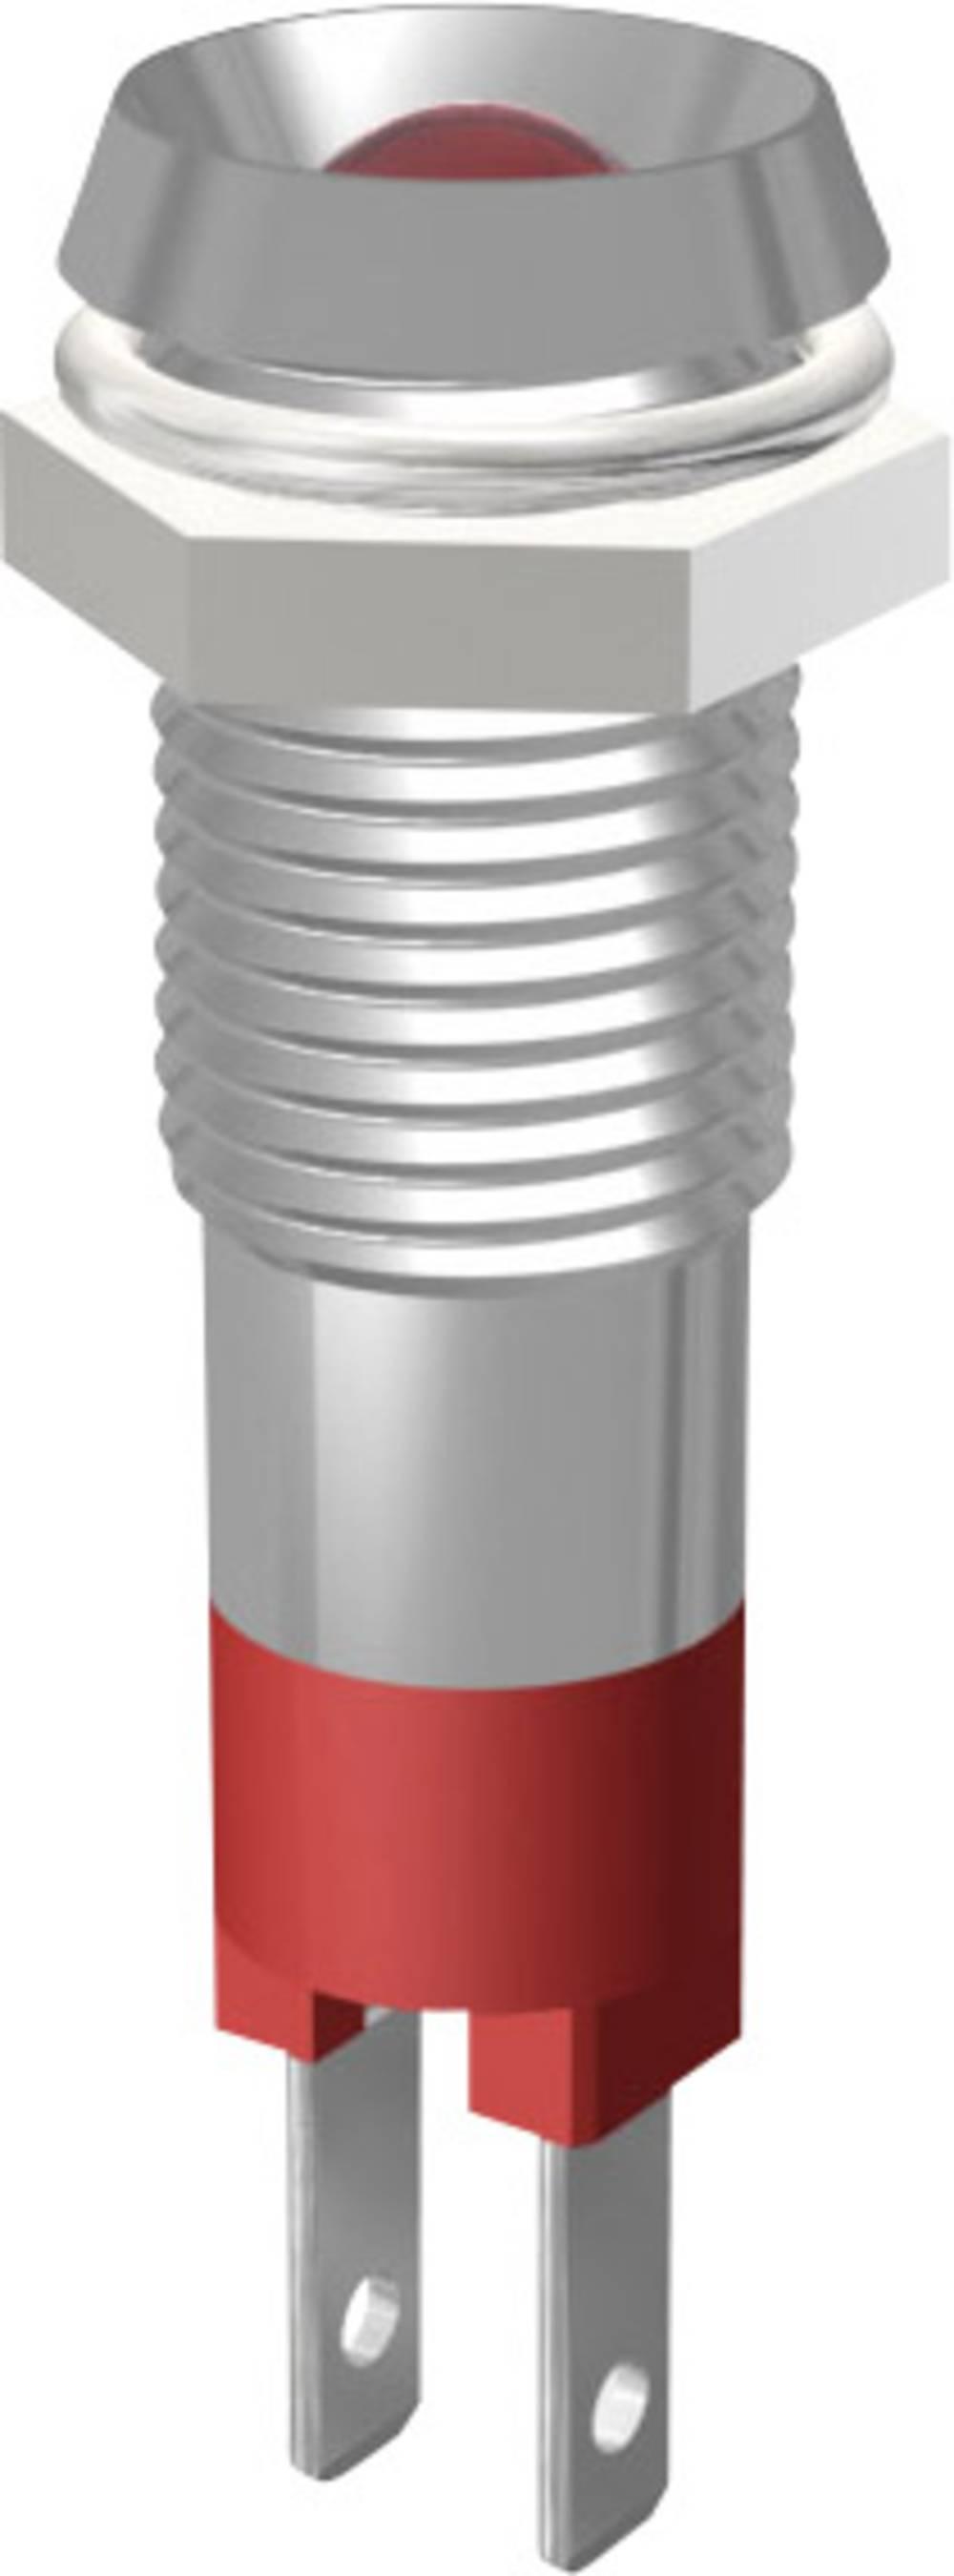 LED-signallampe Signal Construct SMTD08614 24 V/DC 15 mA Hvid